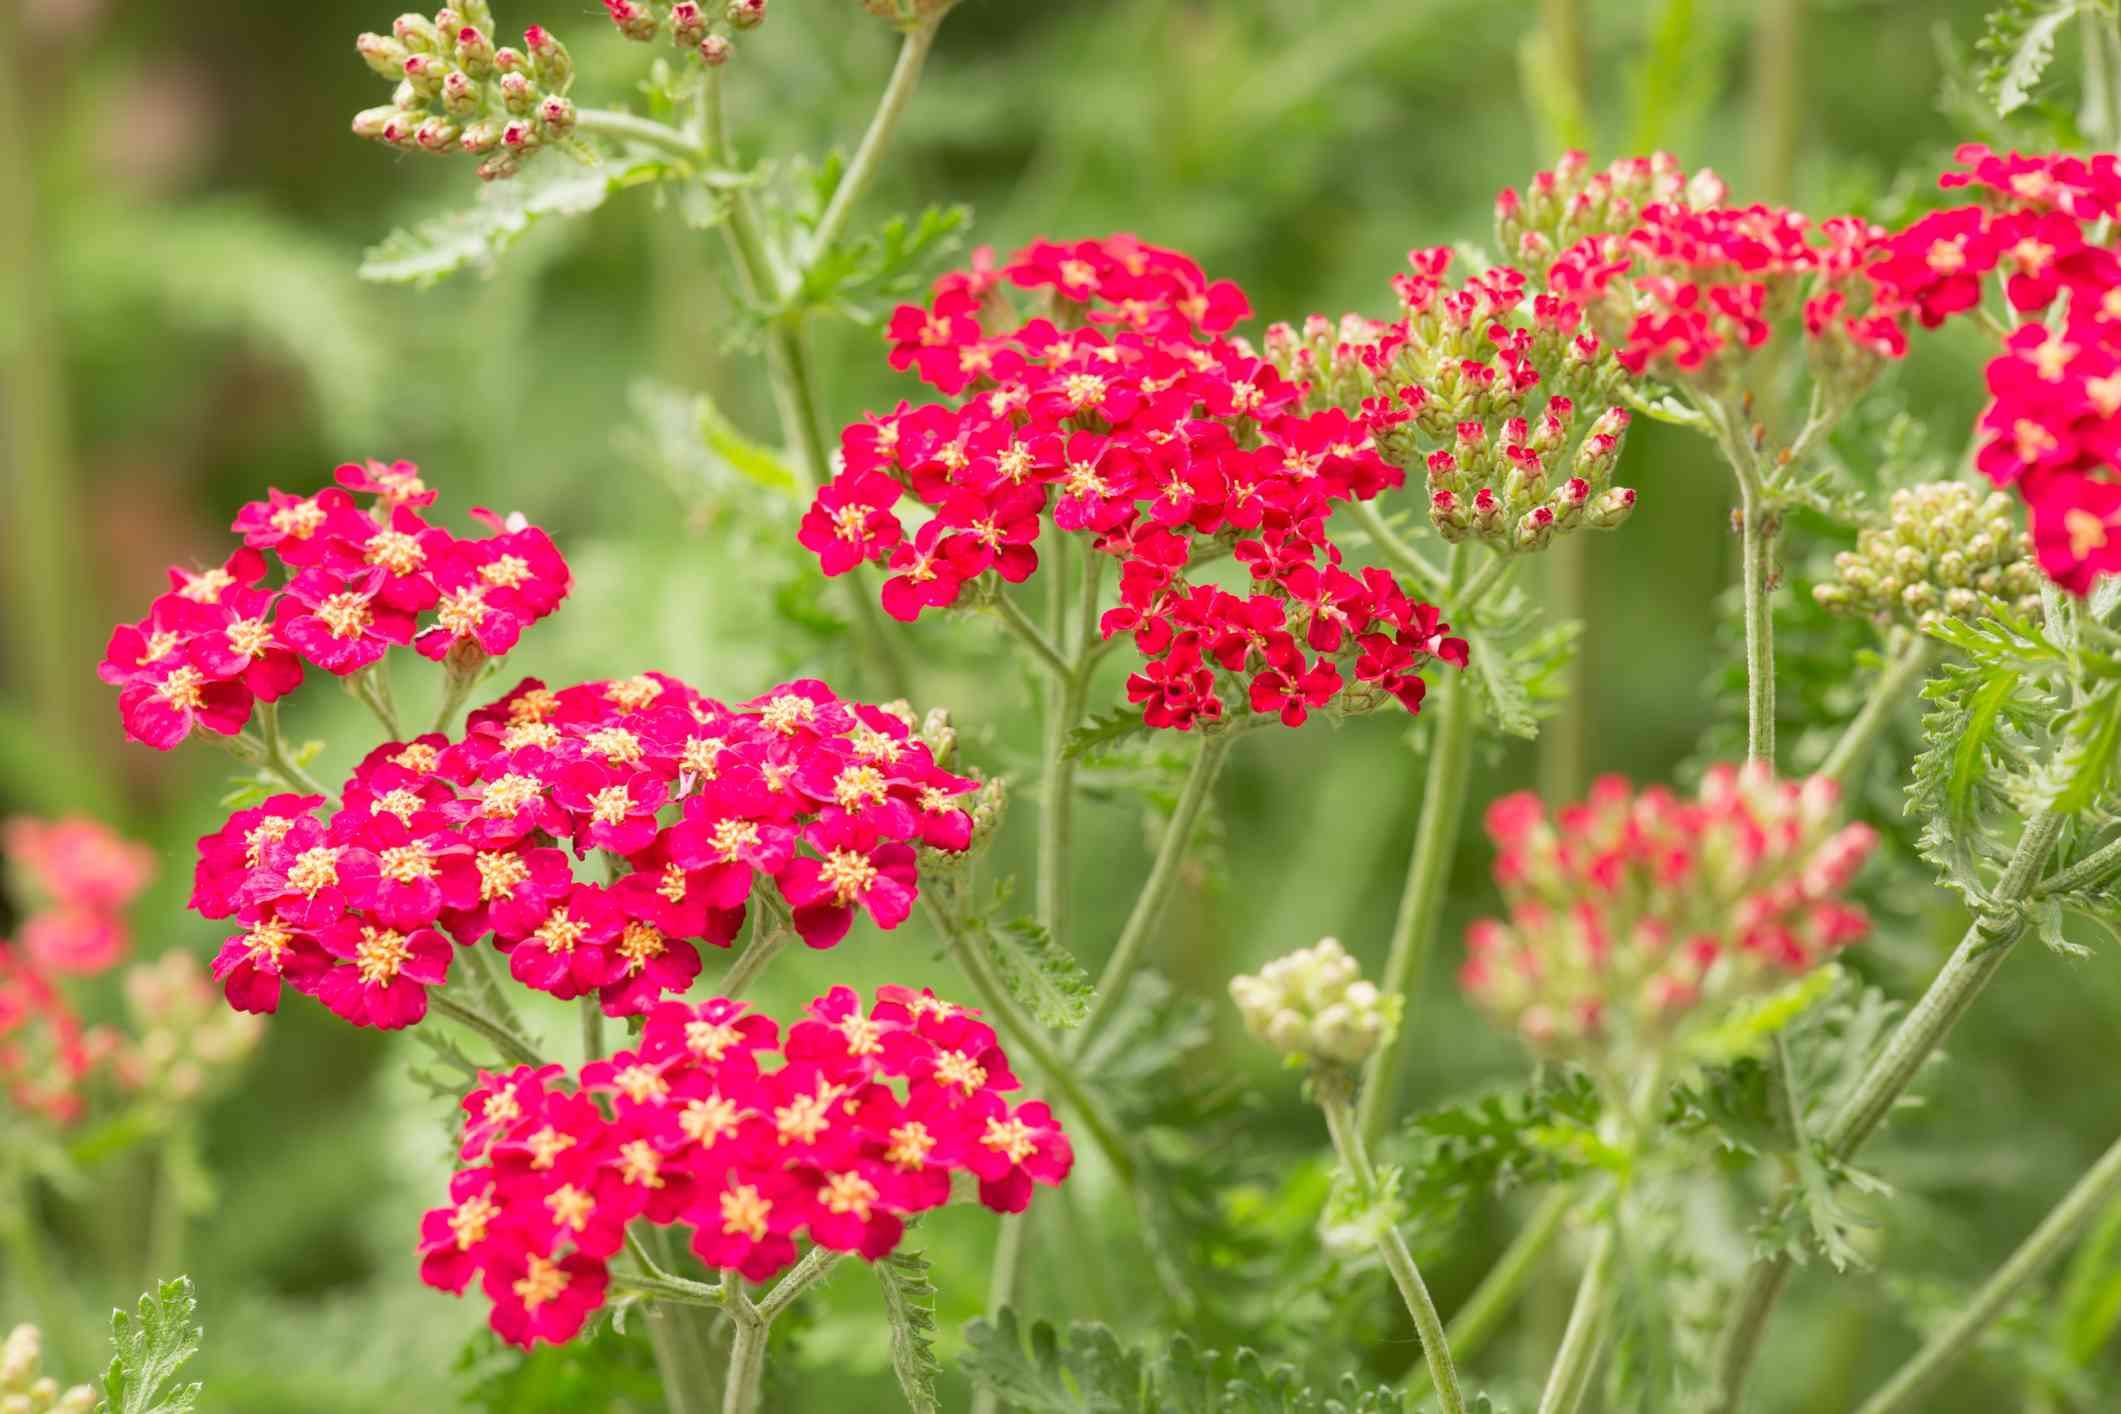 Red yarrow flowers